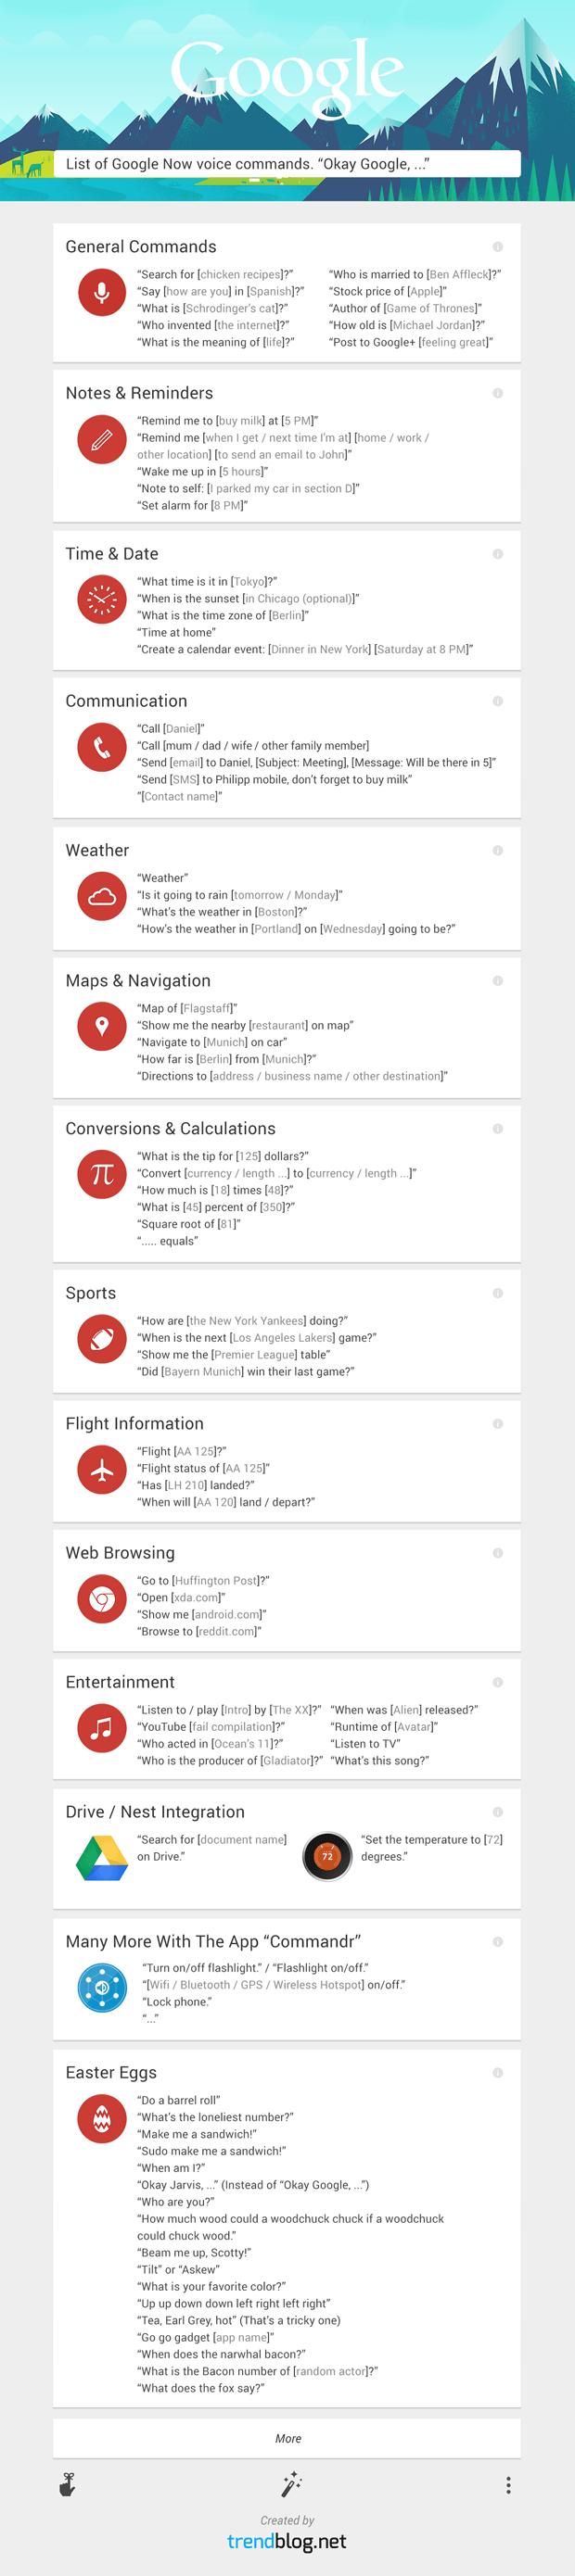 Google Now Sprachbefehle